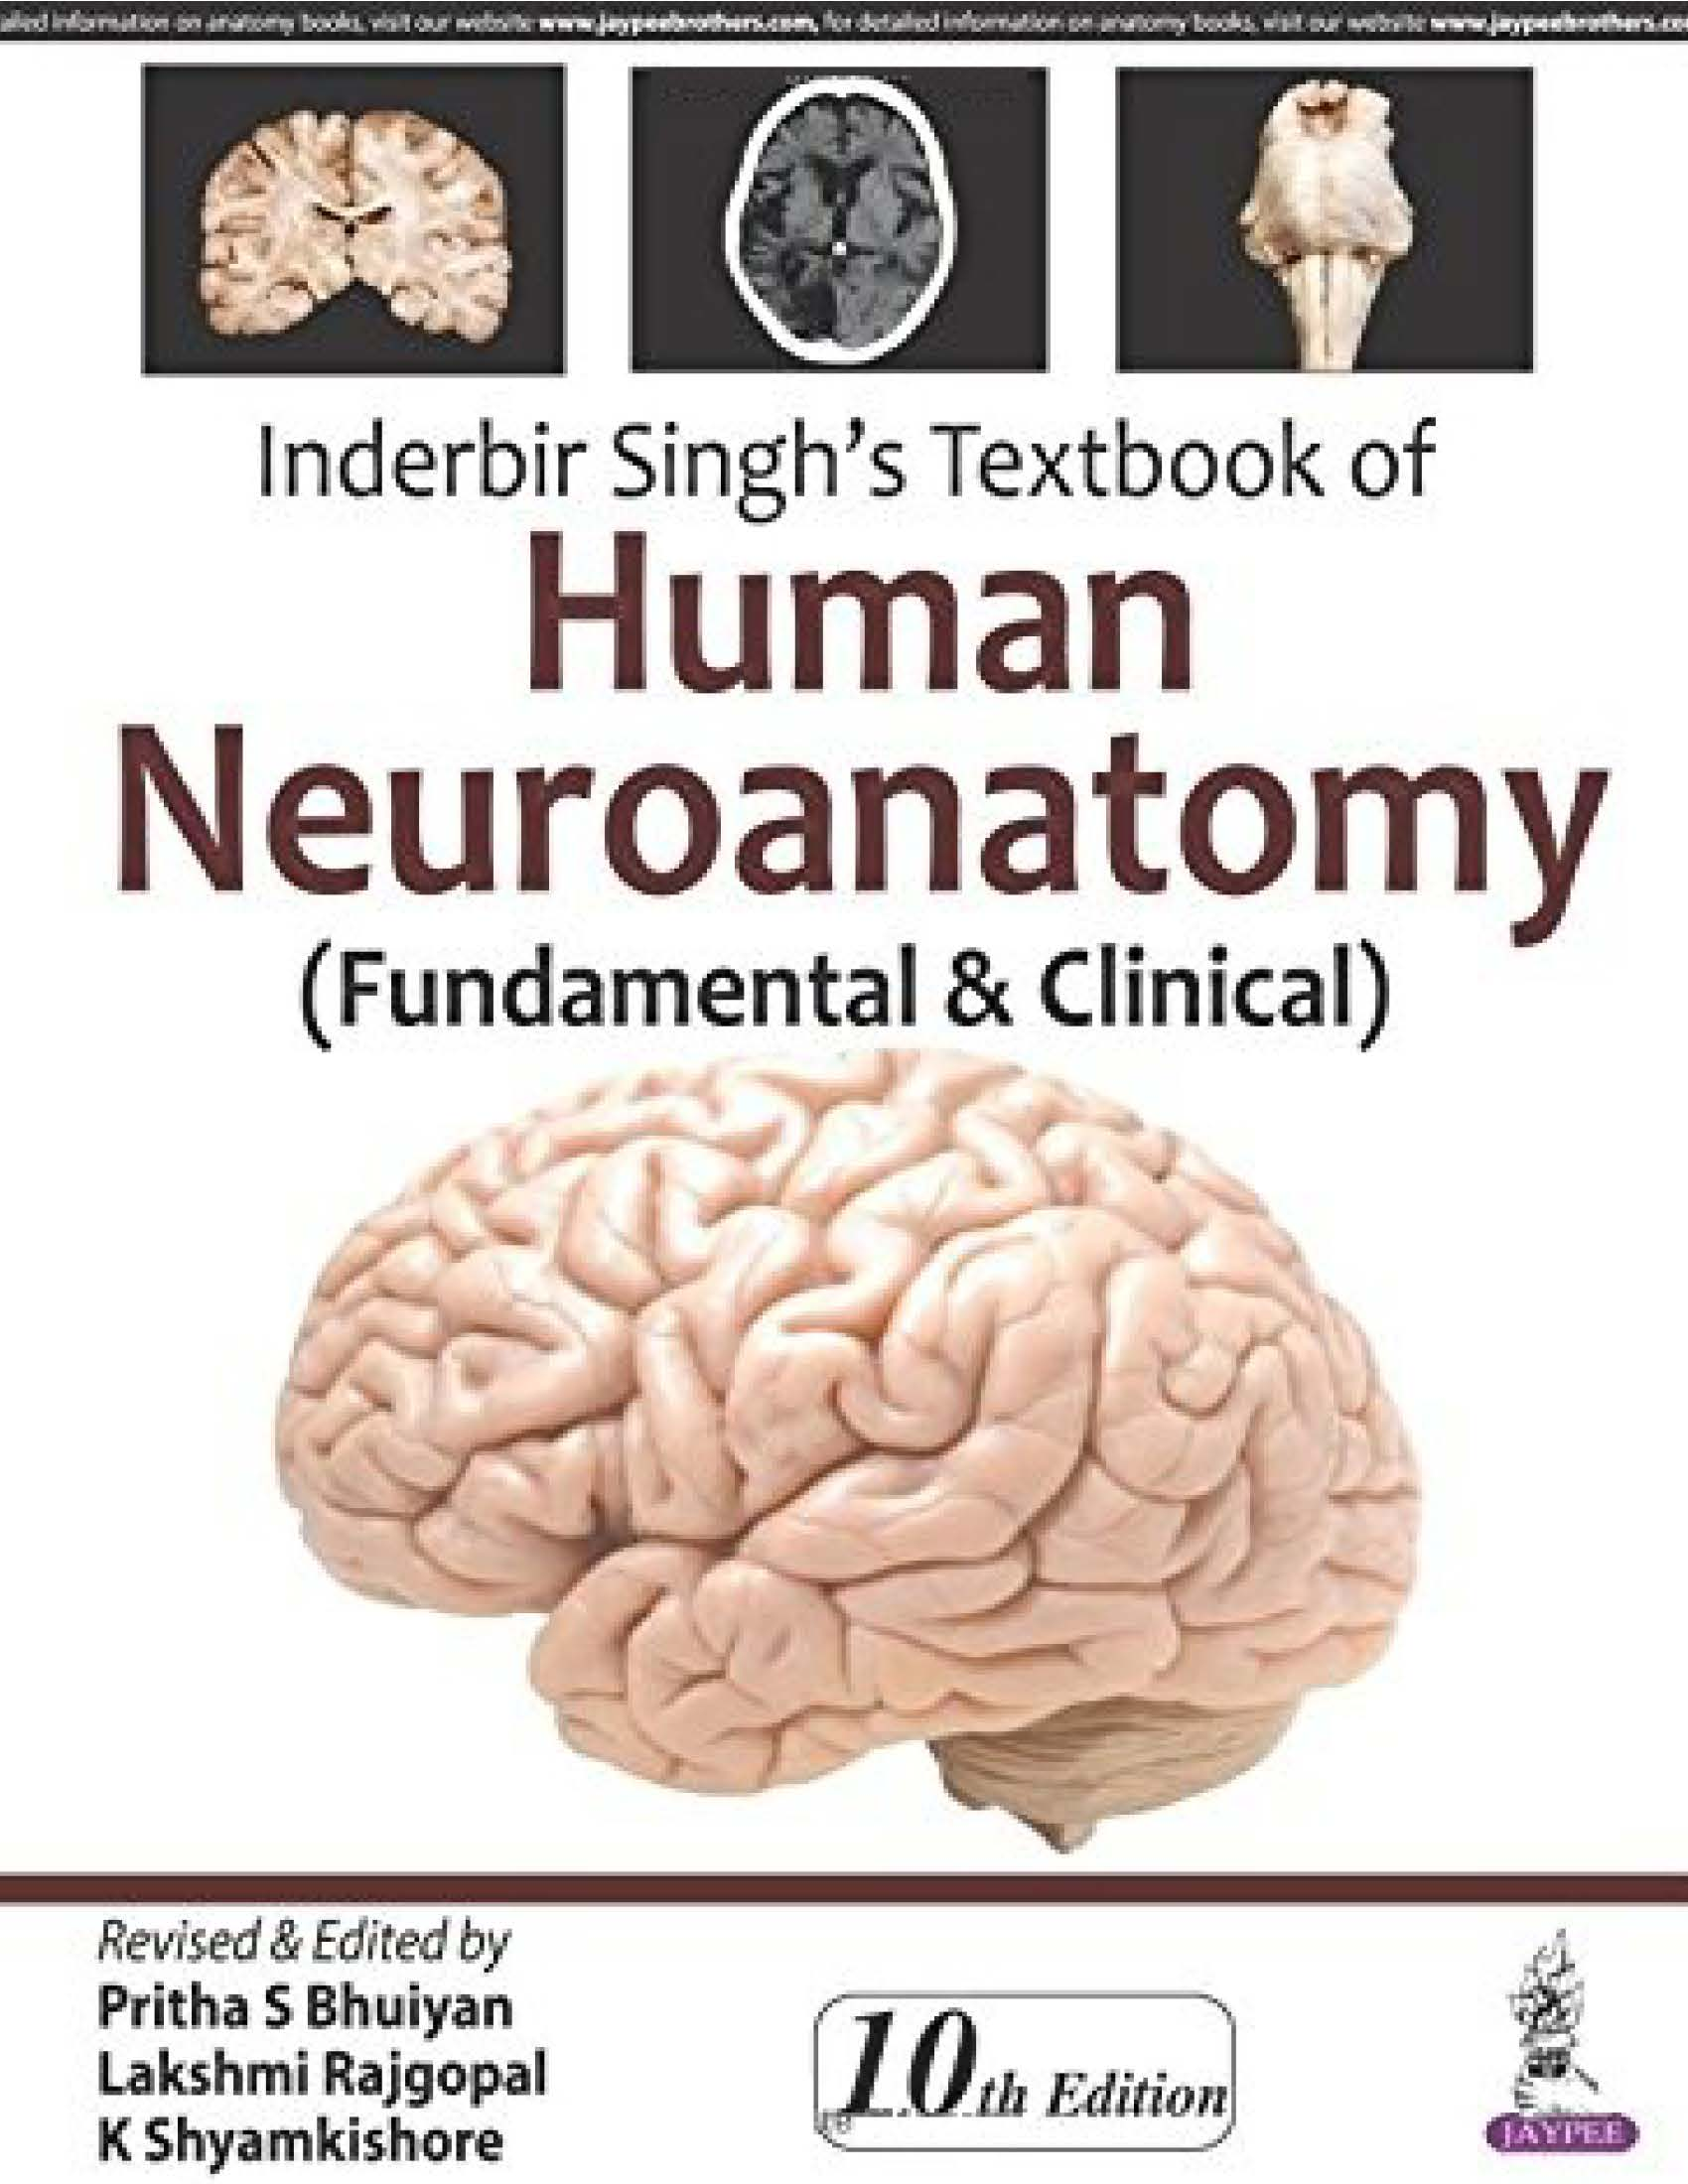 Inderbir Singh\'s Textbook of Human Neuroanatomy PDF Free Download